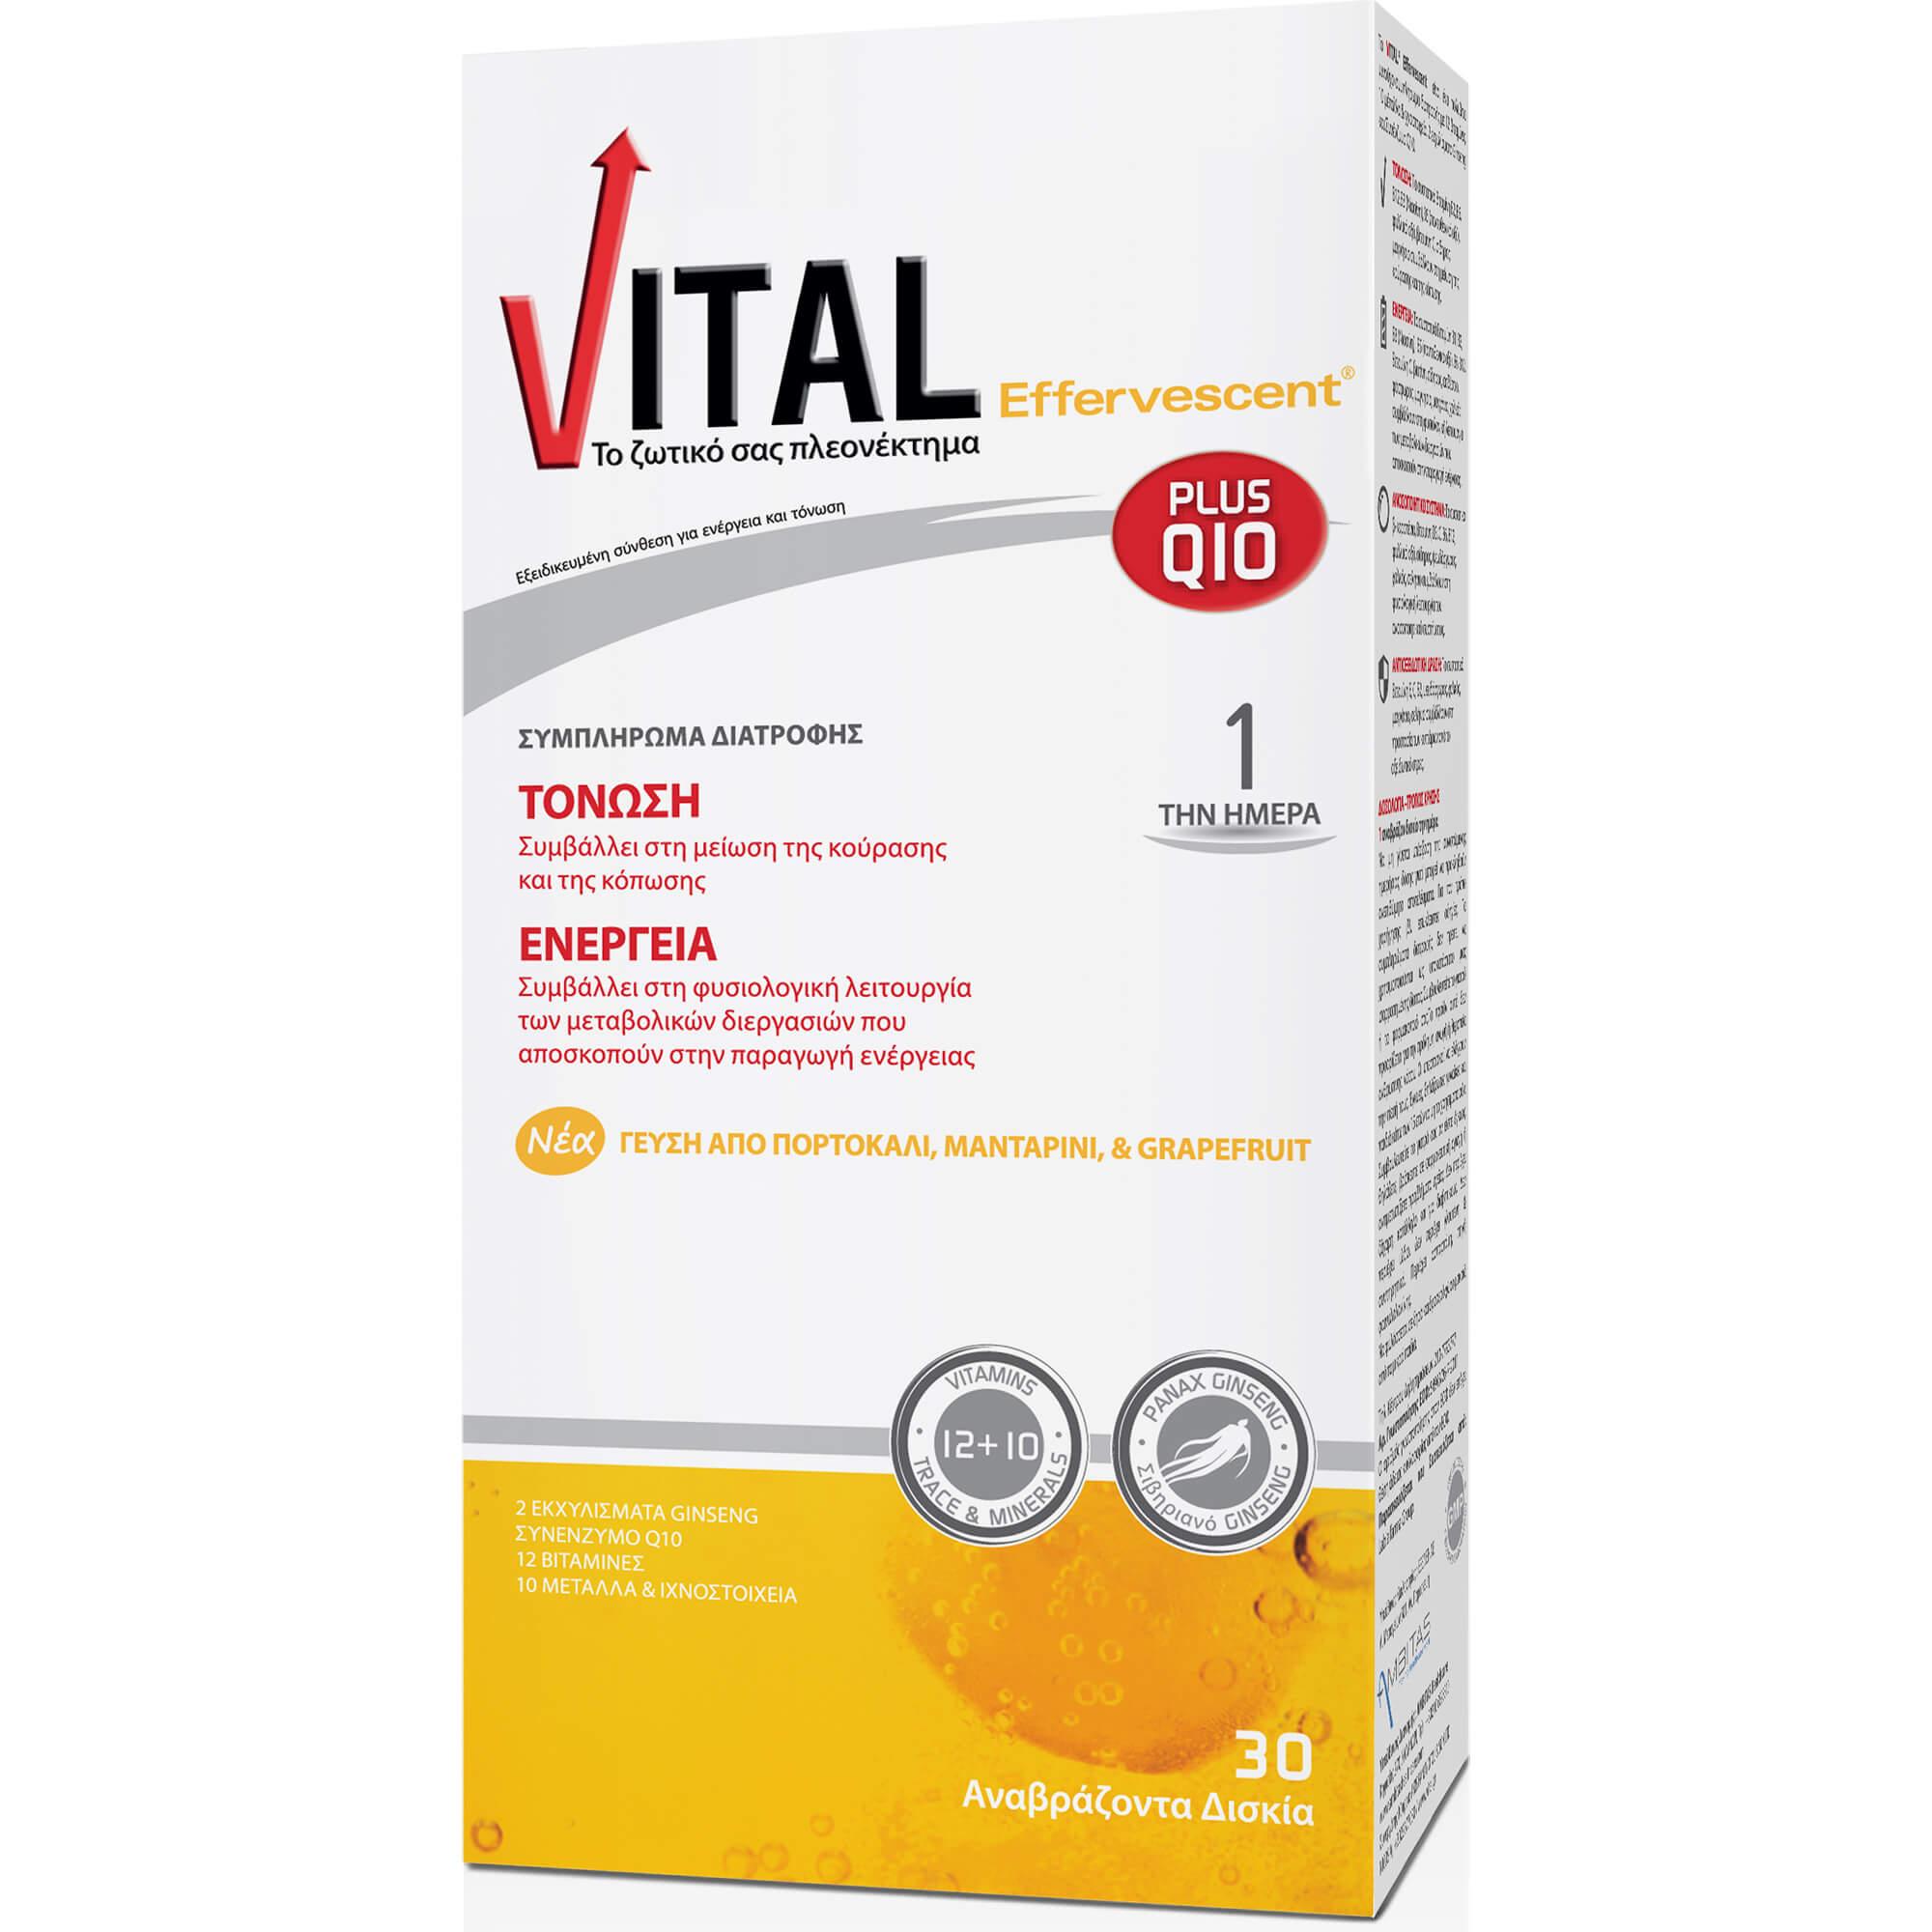 Vital Plus Q10 Eff Πλήρες Και Ισορροπημένο Πολυβιταμινούχο Συμπλήρωμα Διατροφής Αναβράζοντα Δισκία 30Effer.Tabs